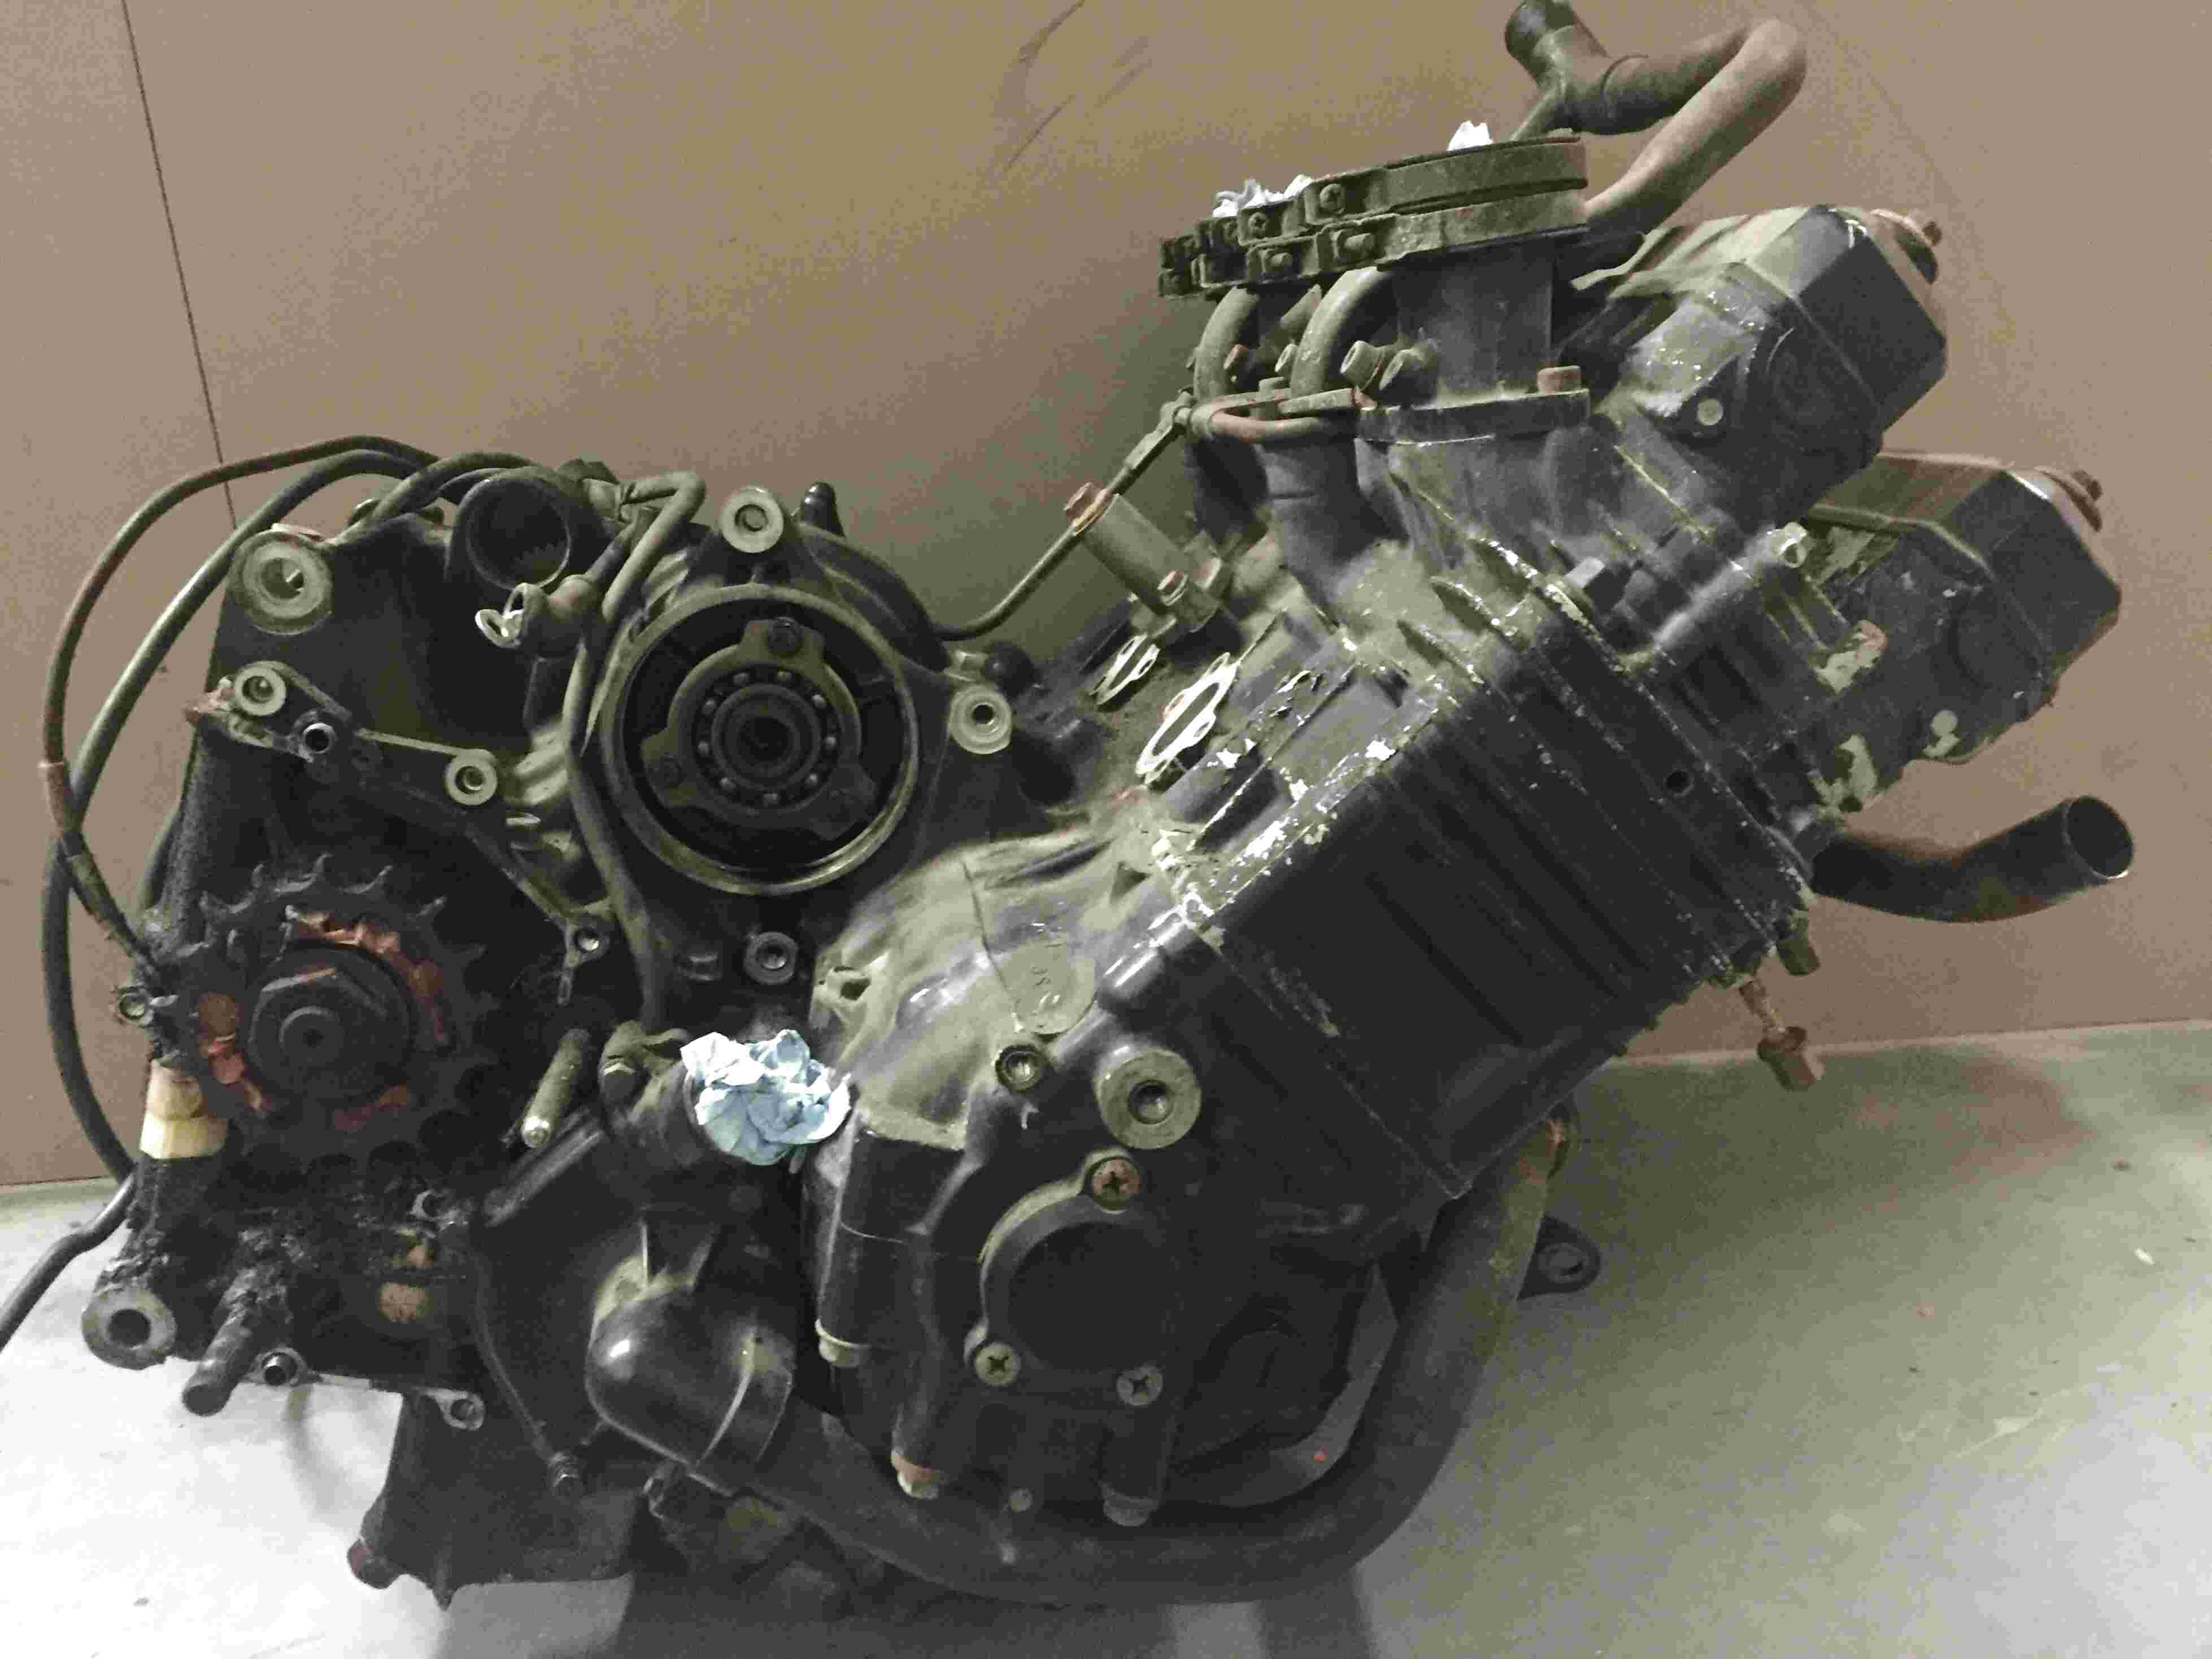 yamaha fzr 750 engine for sale